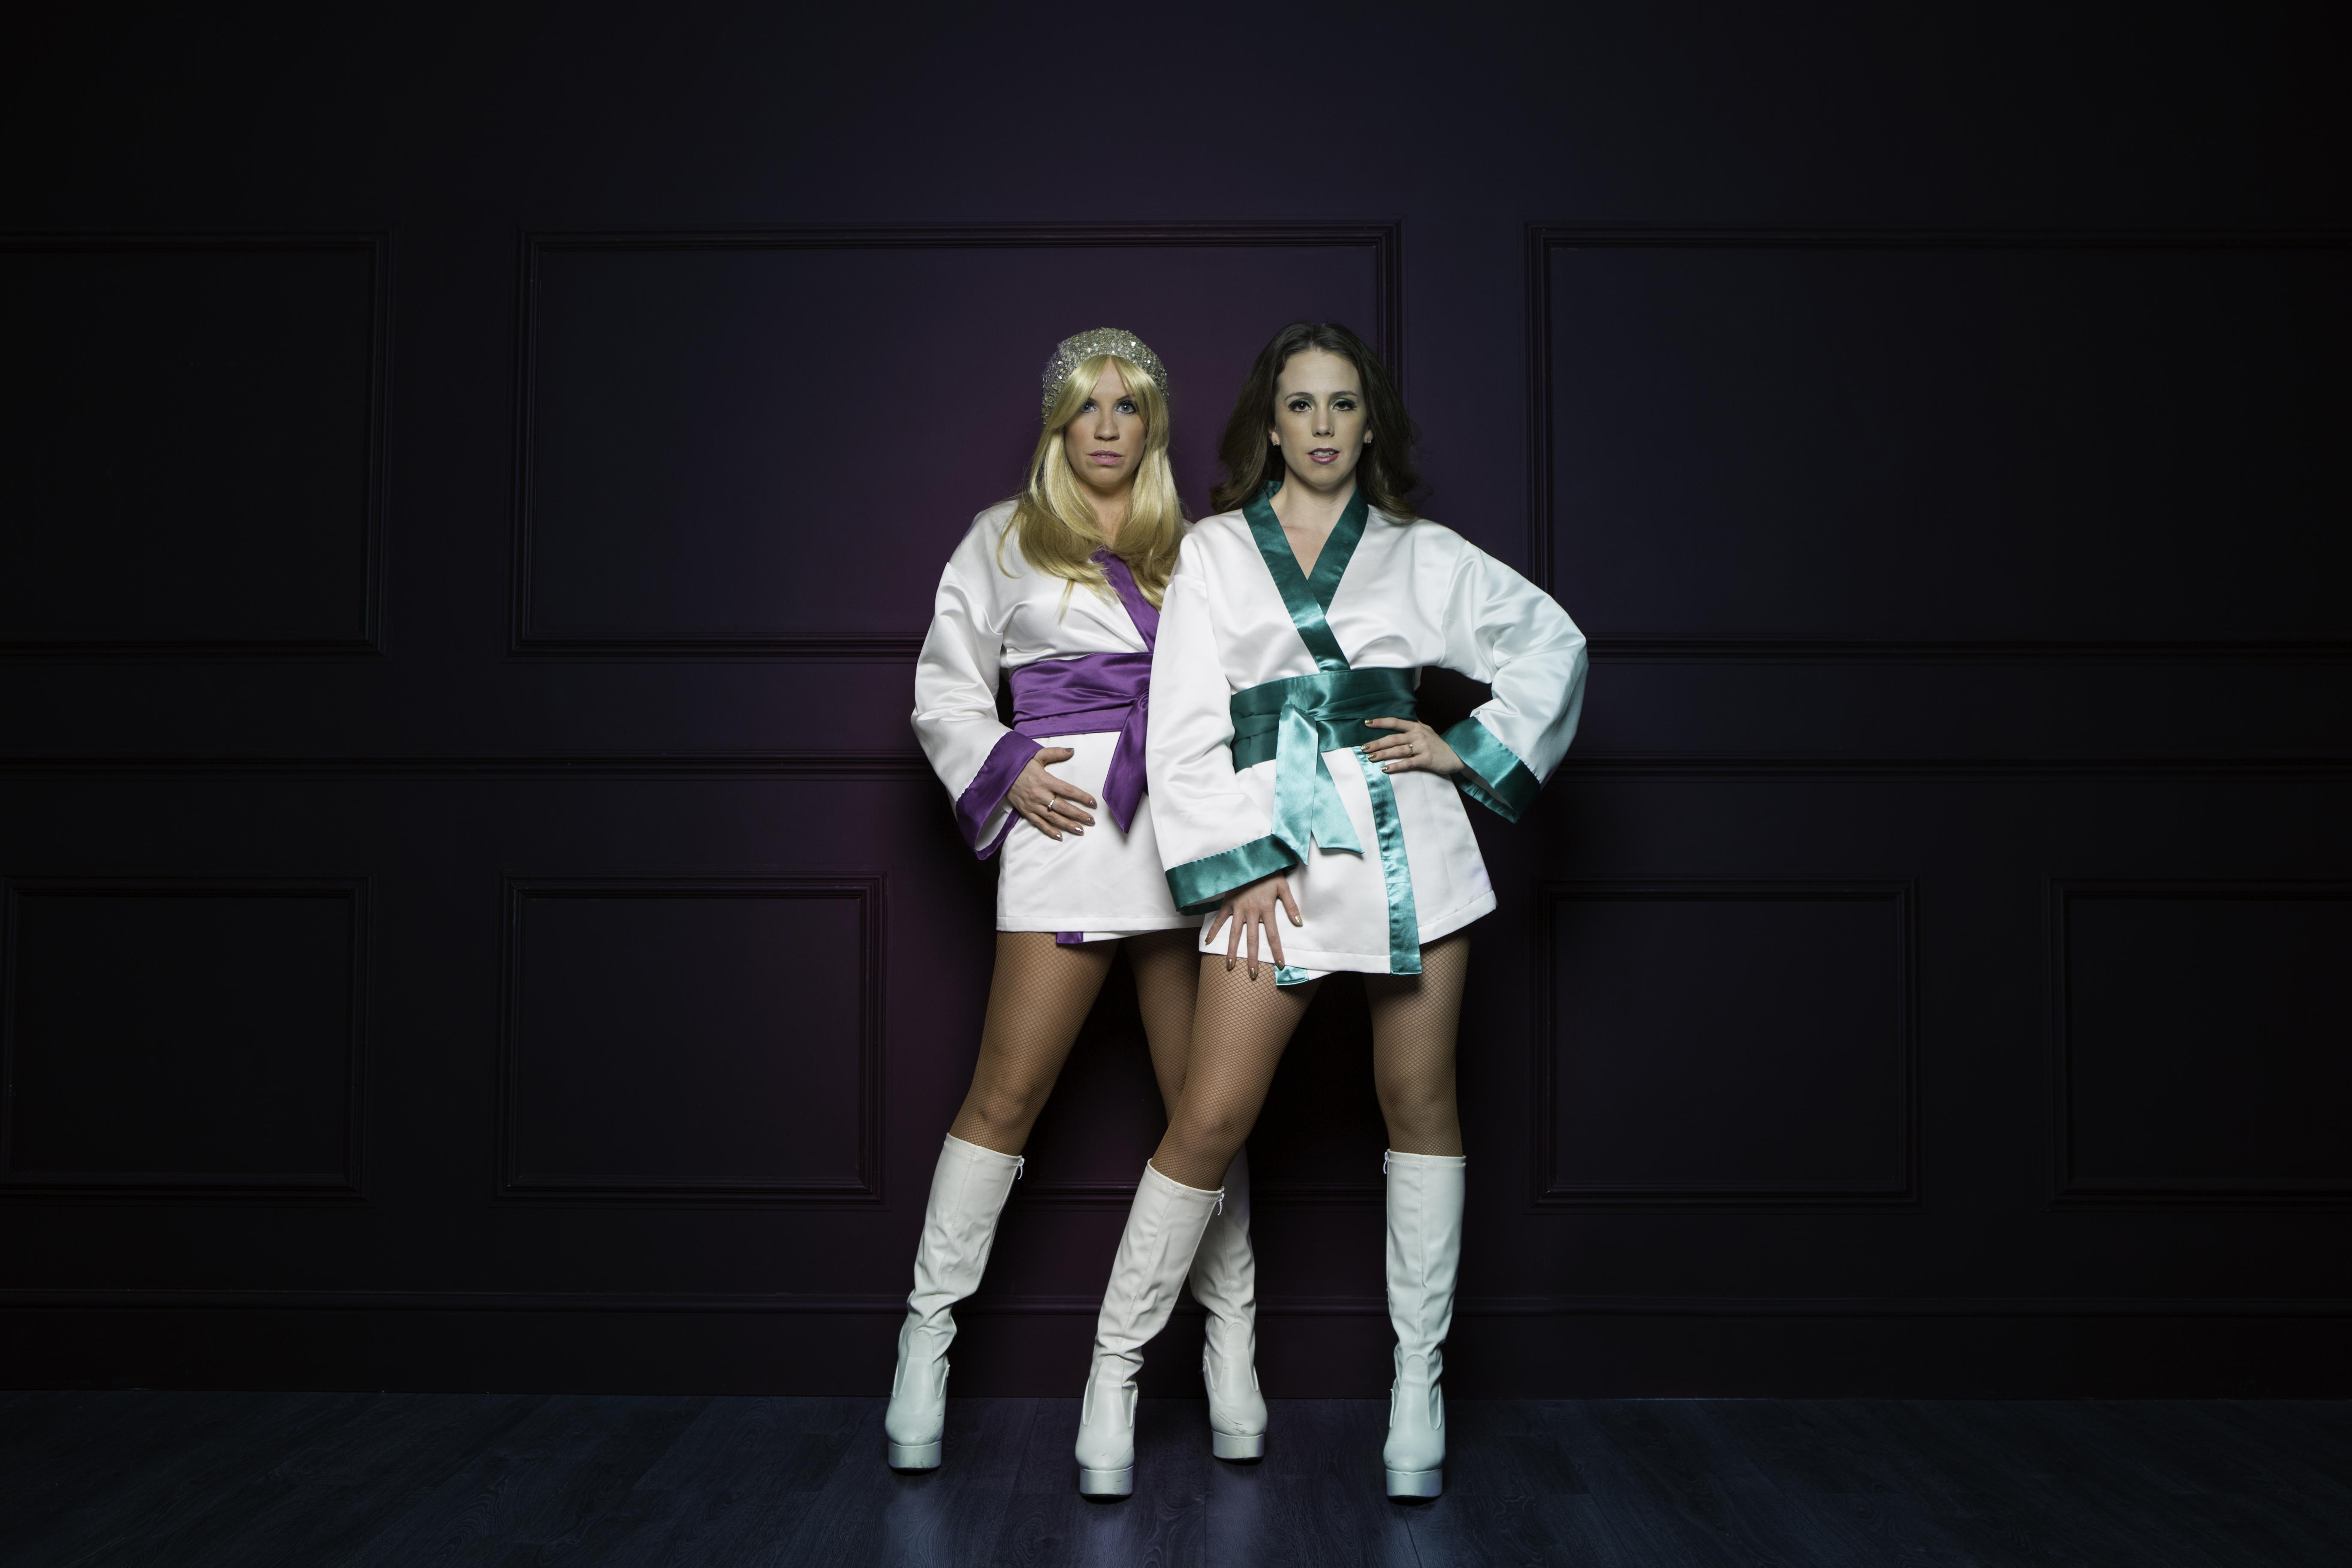 ABBA Duettes